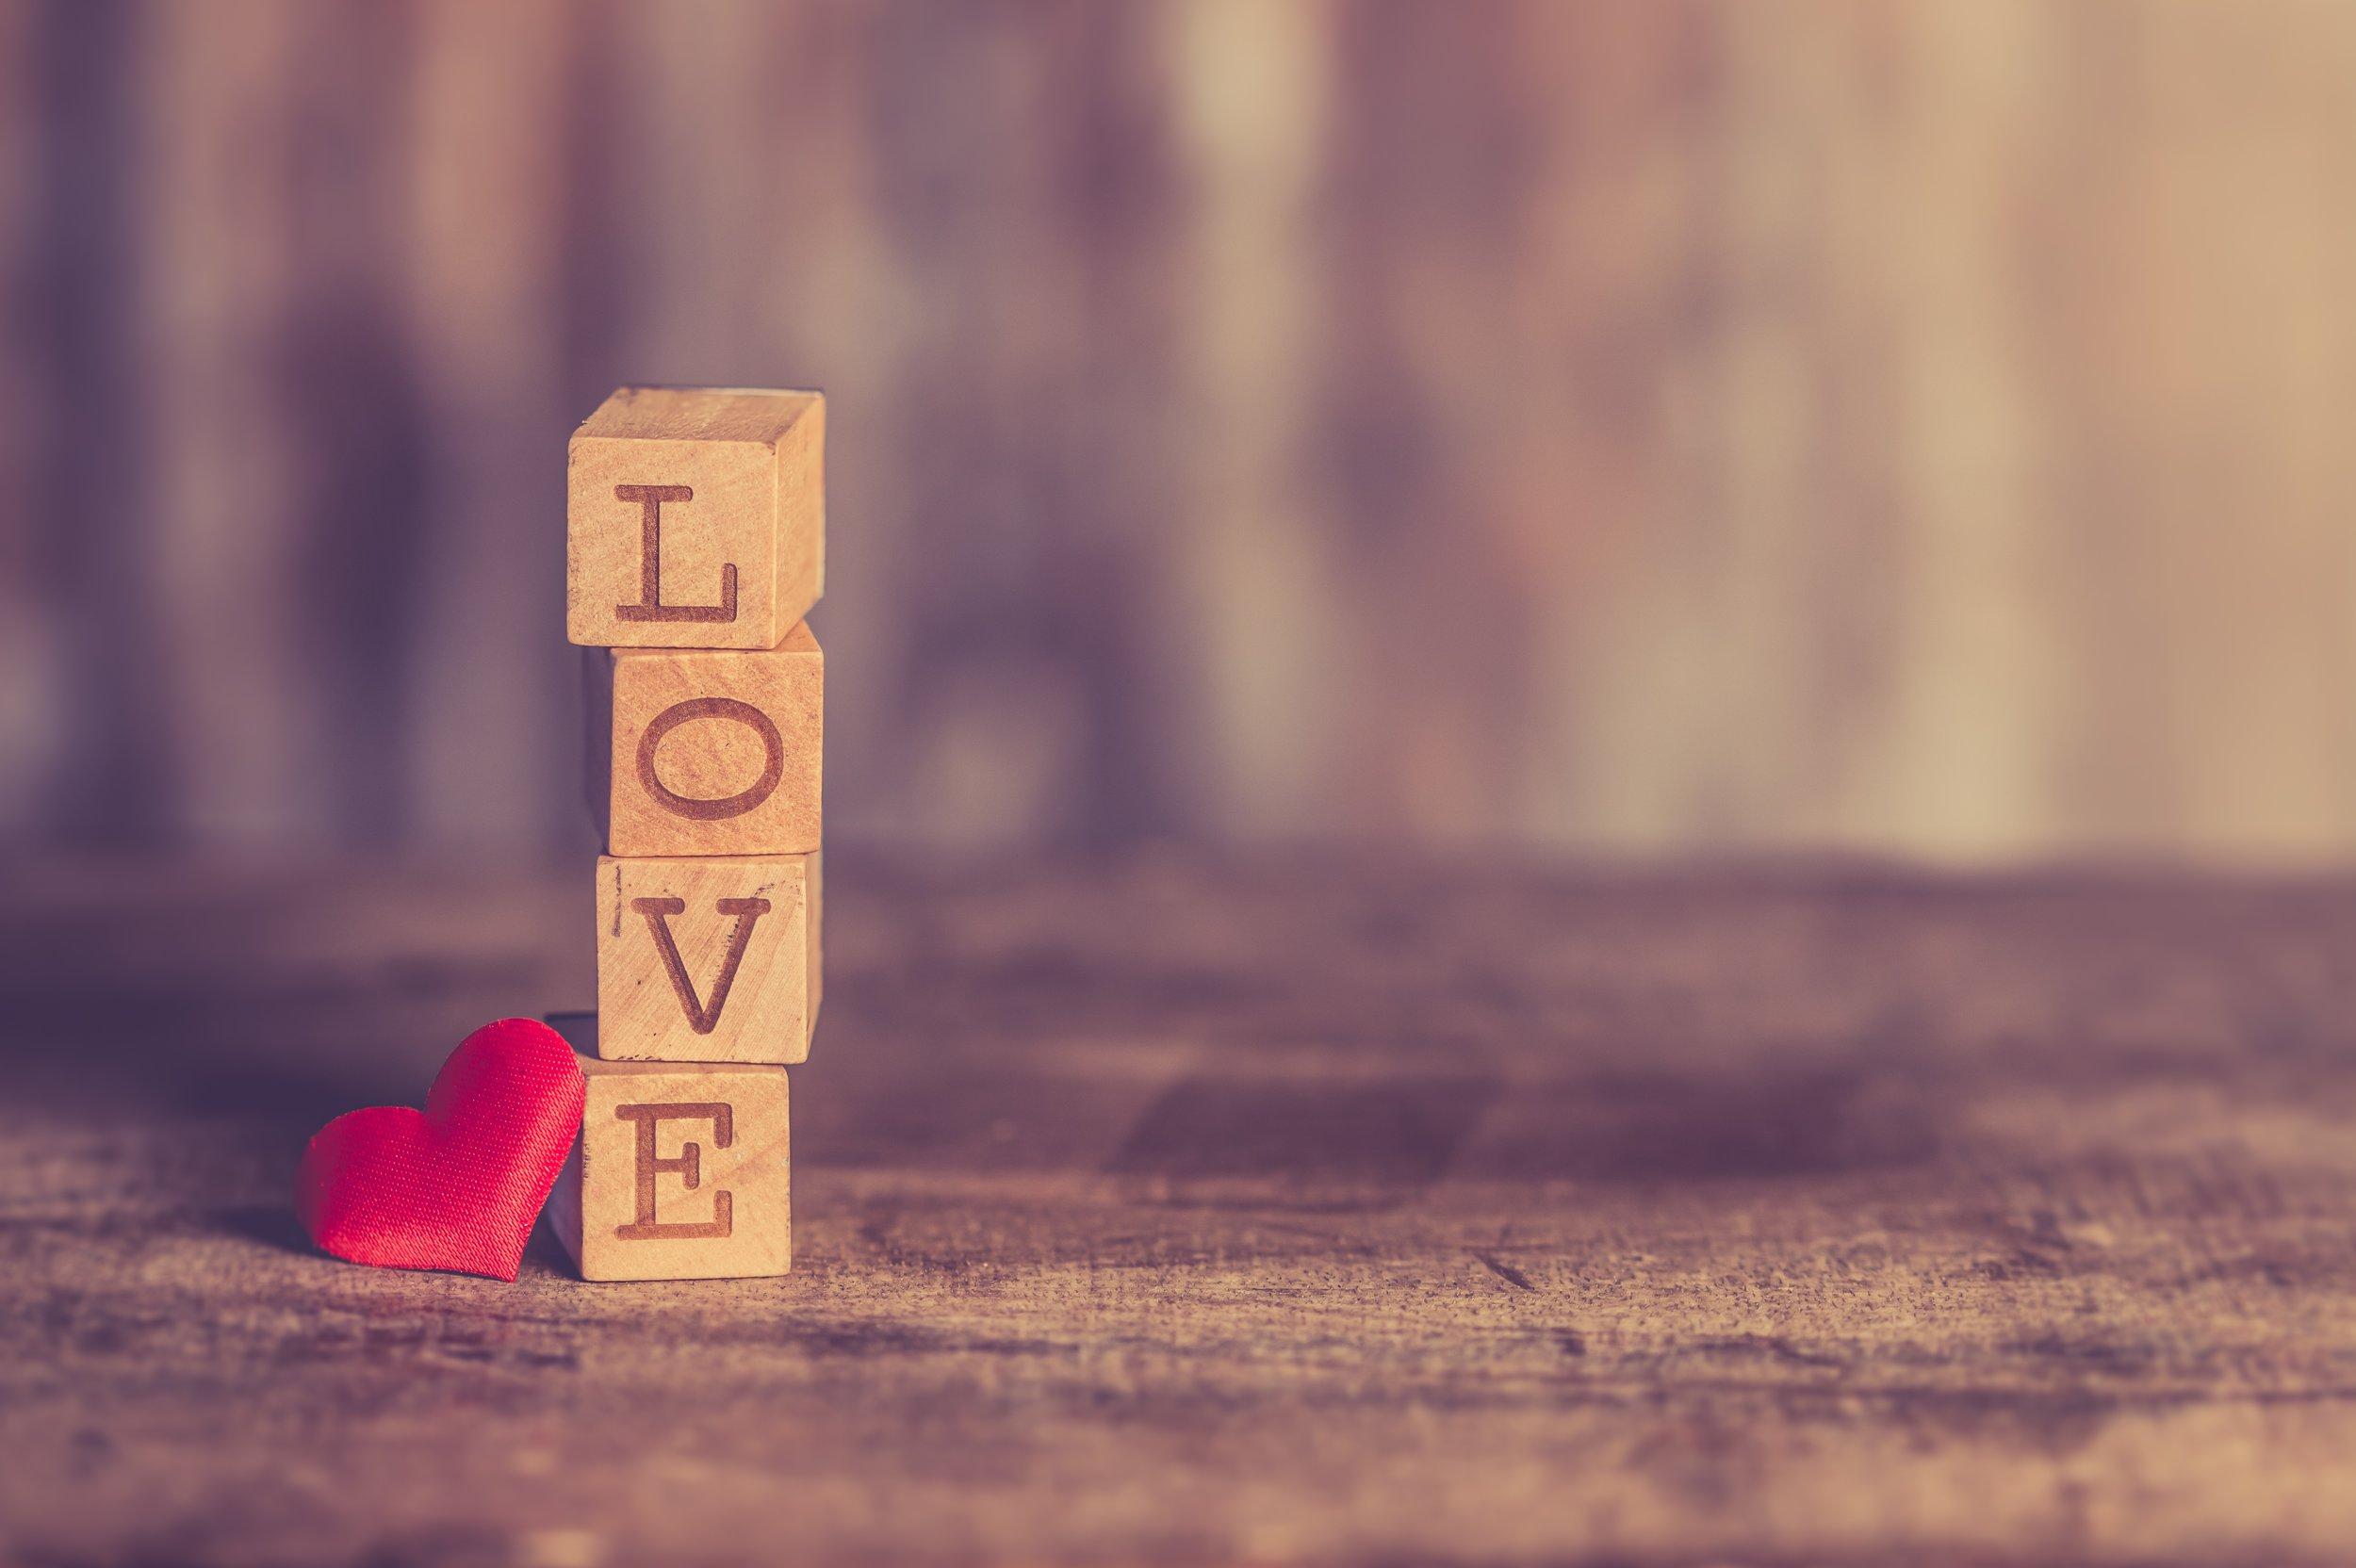 Self Love - All love starts with self love